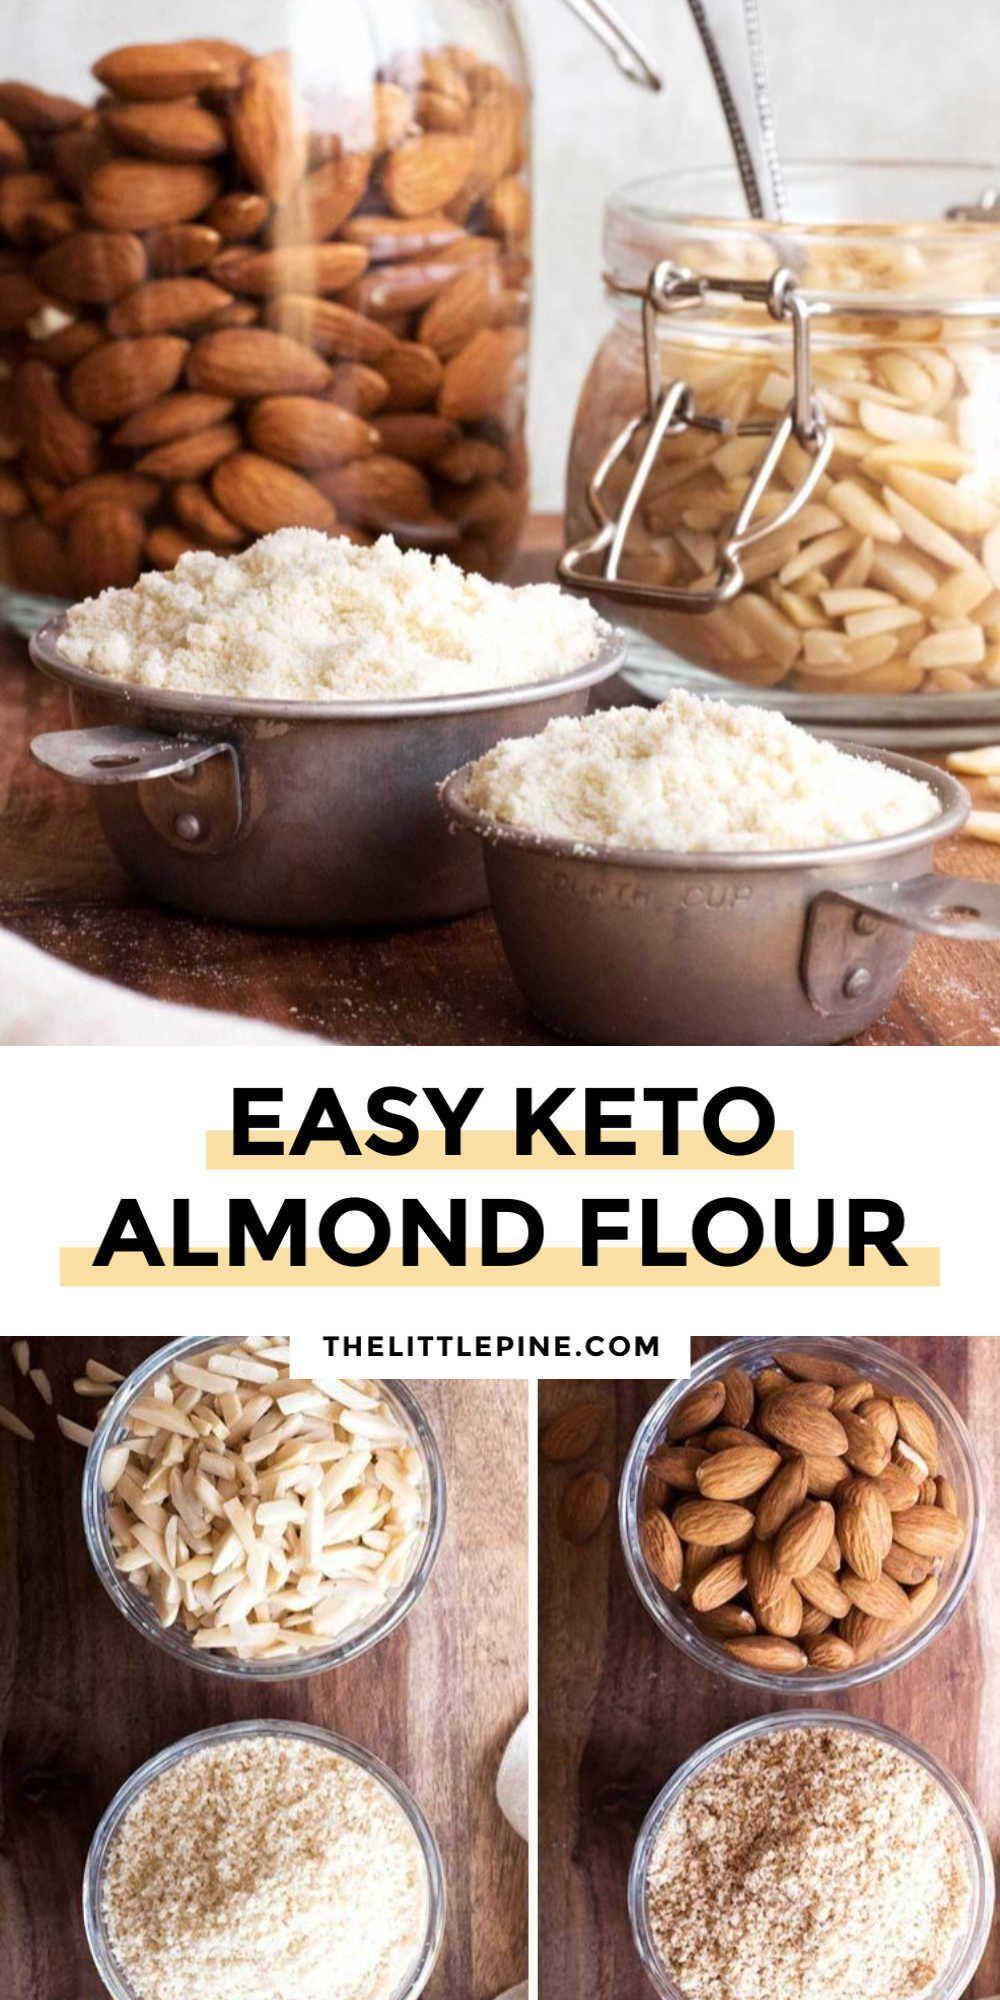 How To Make Almond Flour (Gluten Free + Keto!) Recipe in